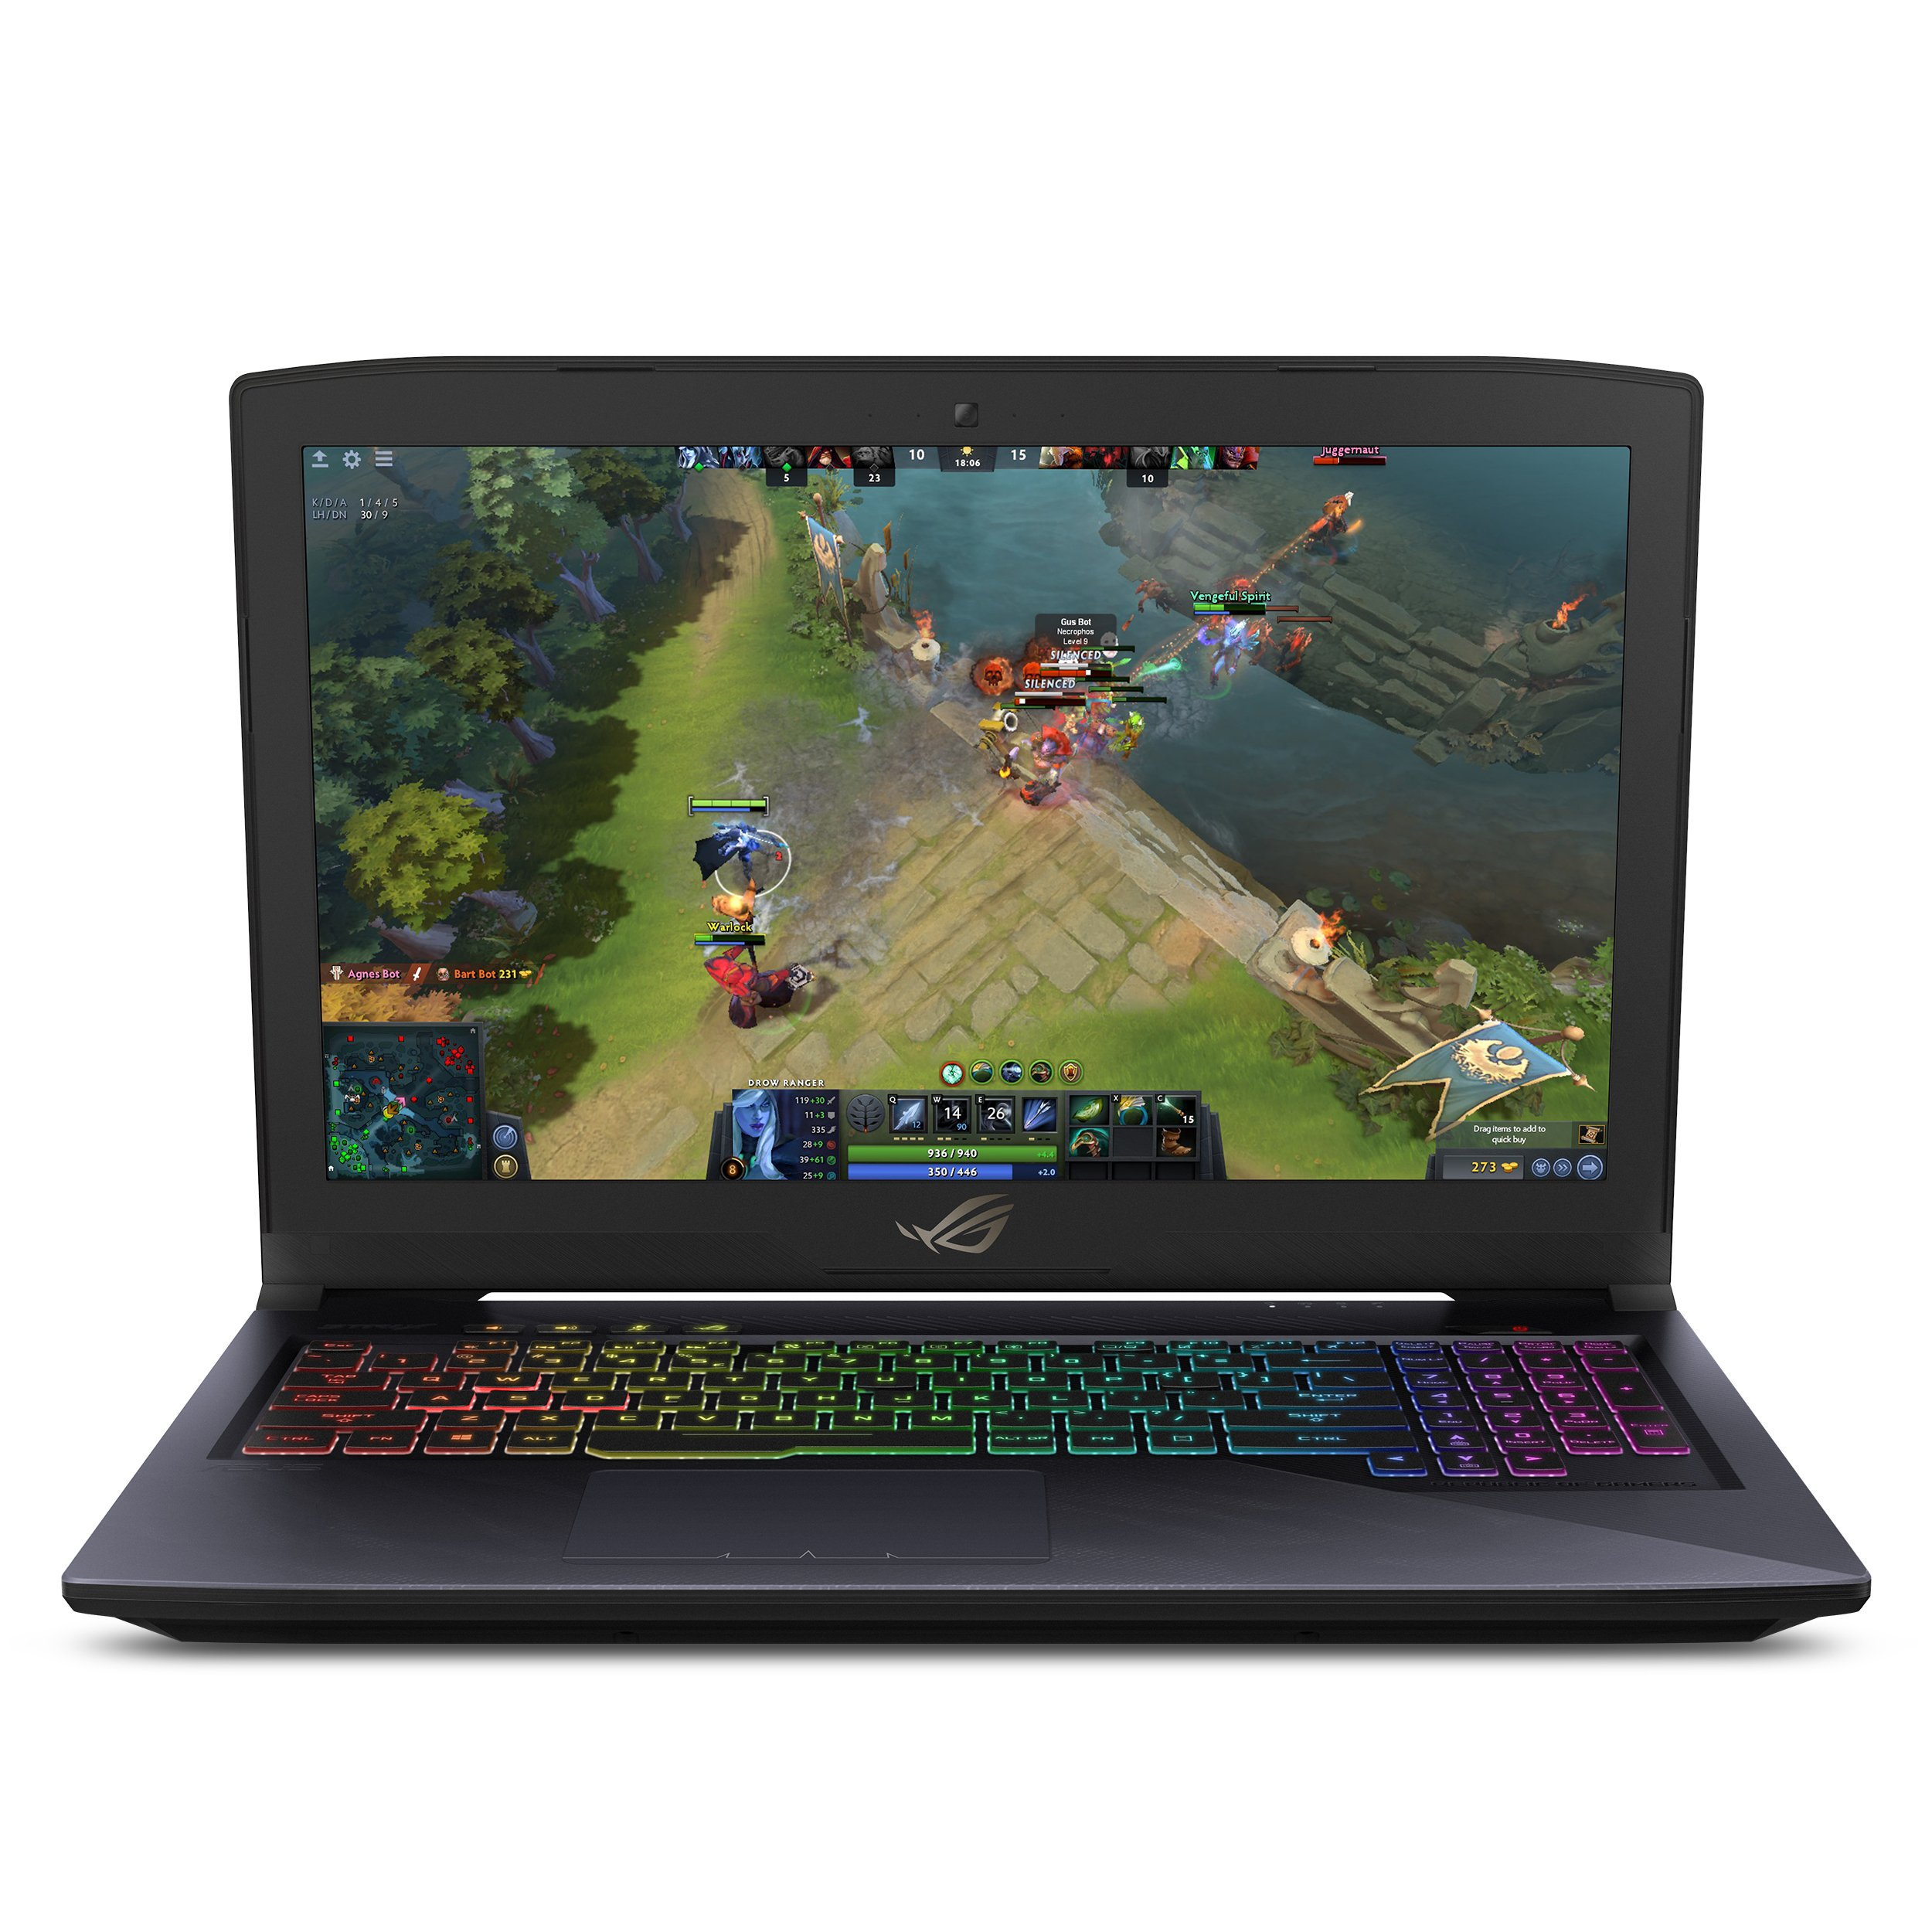 "Asus ROG Strix Hero Edition Gaming Laptop, 15.6"" Full HD 120Hz 3ms, 8th-Gen Intel Core i5-8300H Processor, GeForce GTX 1050 Ti 4GB, 8GB DDR4, 128GB PCIe SSD + 1TB FireCuda, Windows 10 - GL503GE-ES52"